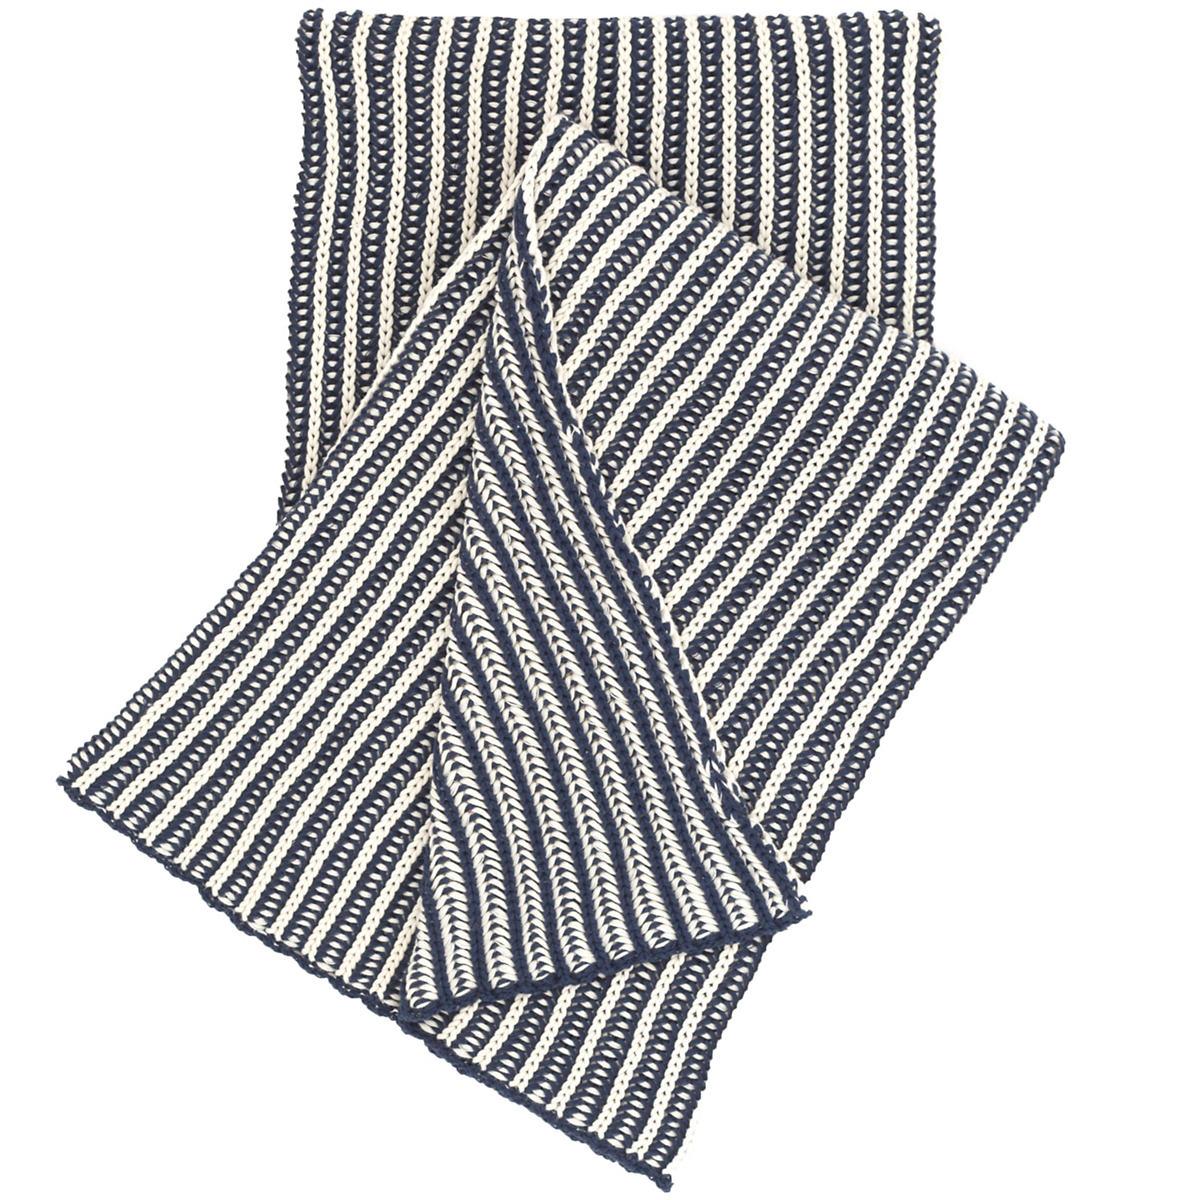 Cozy Knit Indigo Throw